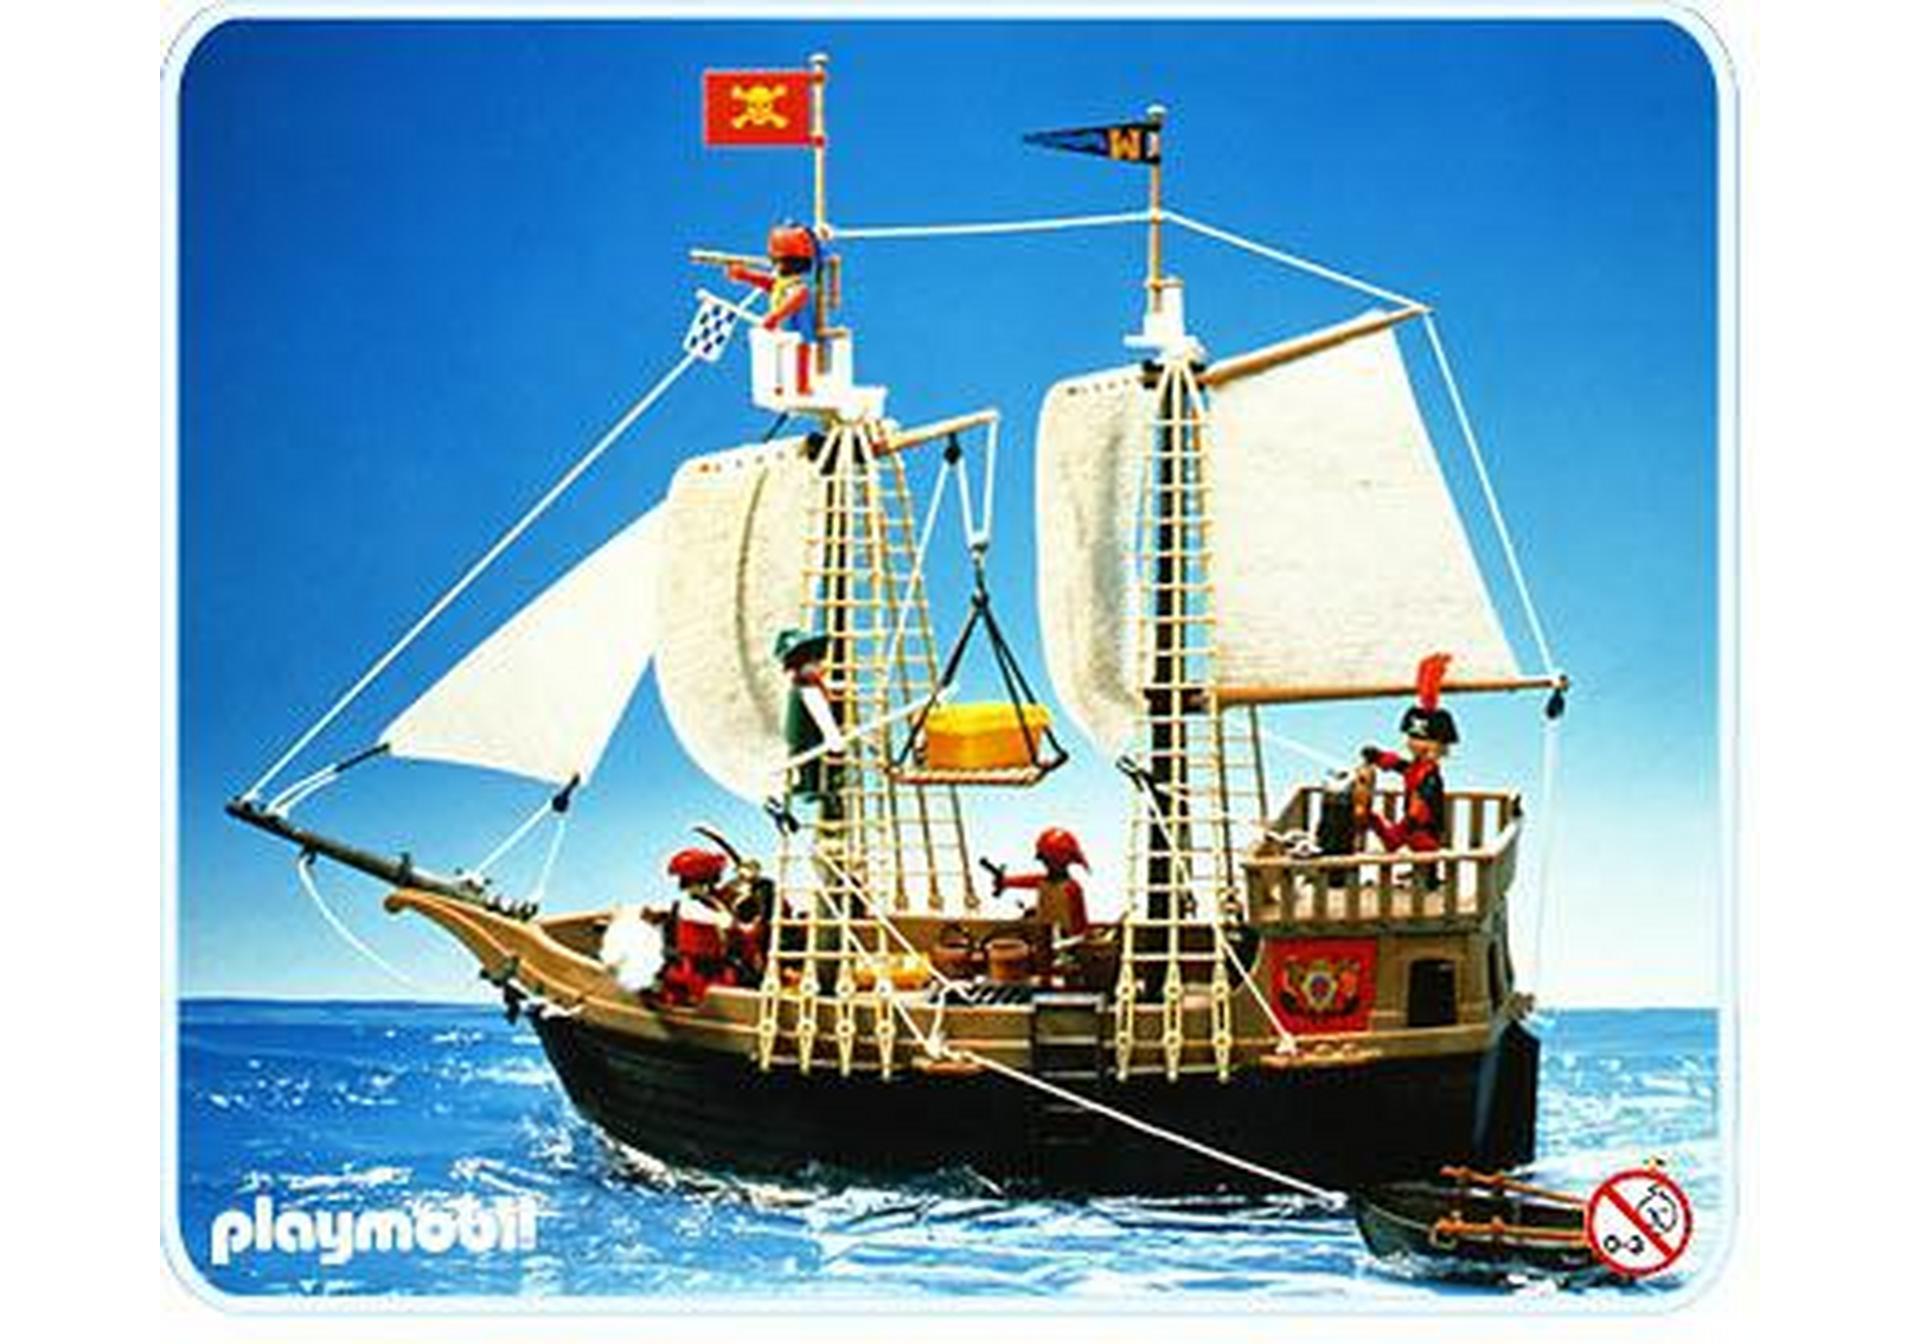 Piratenschiff 3550 a playmobil deutschland for Barco pirata playmobil